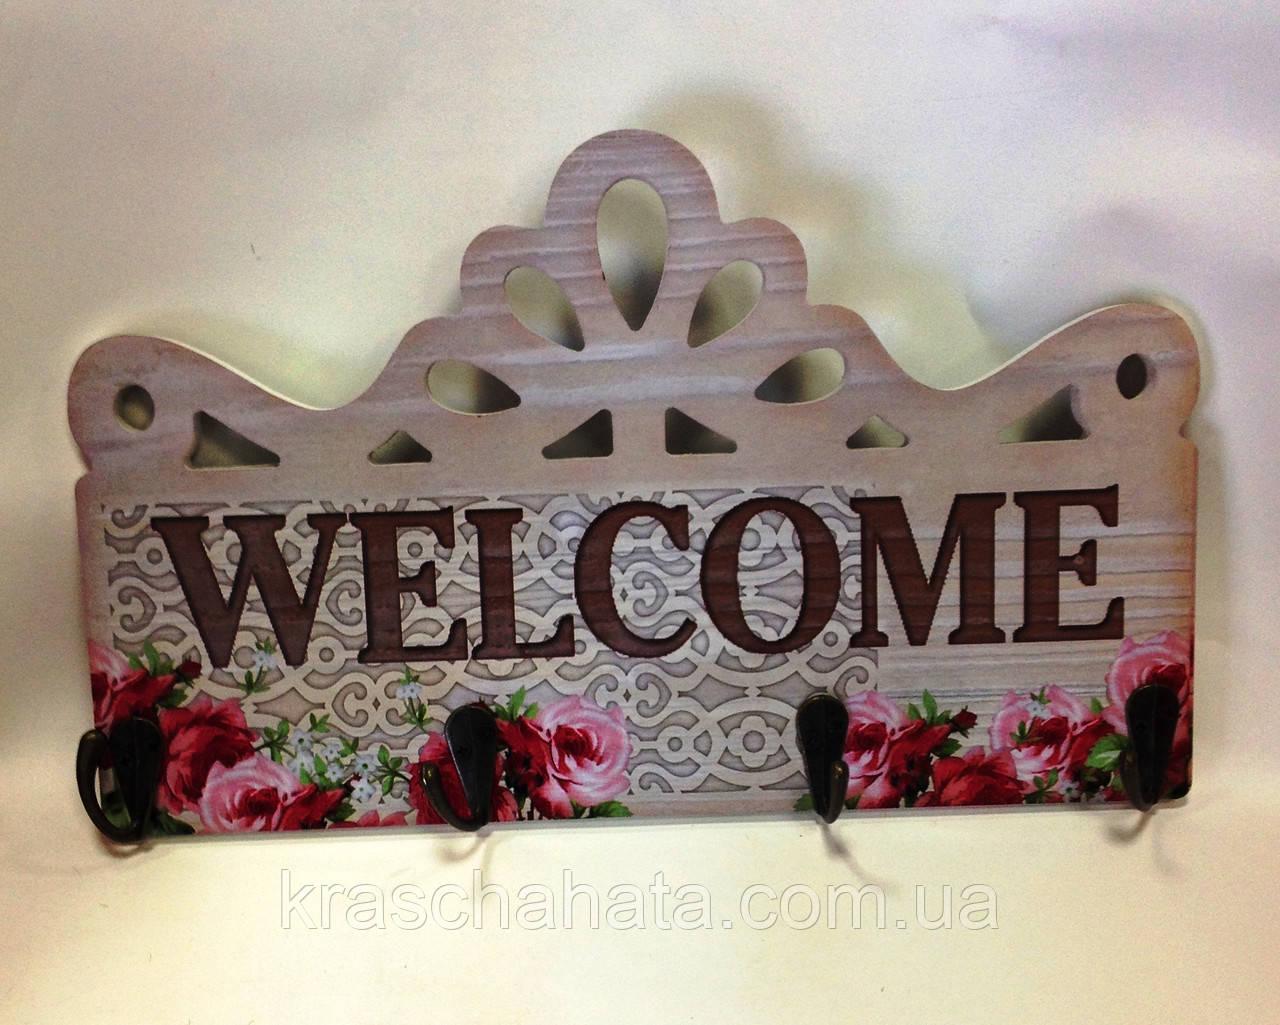 Интерьерная табличка, Welcome, Прованс, 4 крючка, Декор для дома, Днепропетровск, фото 1